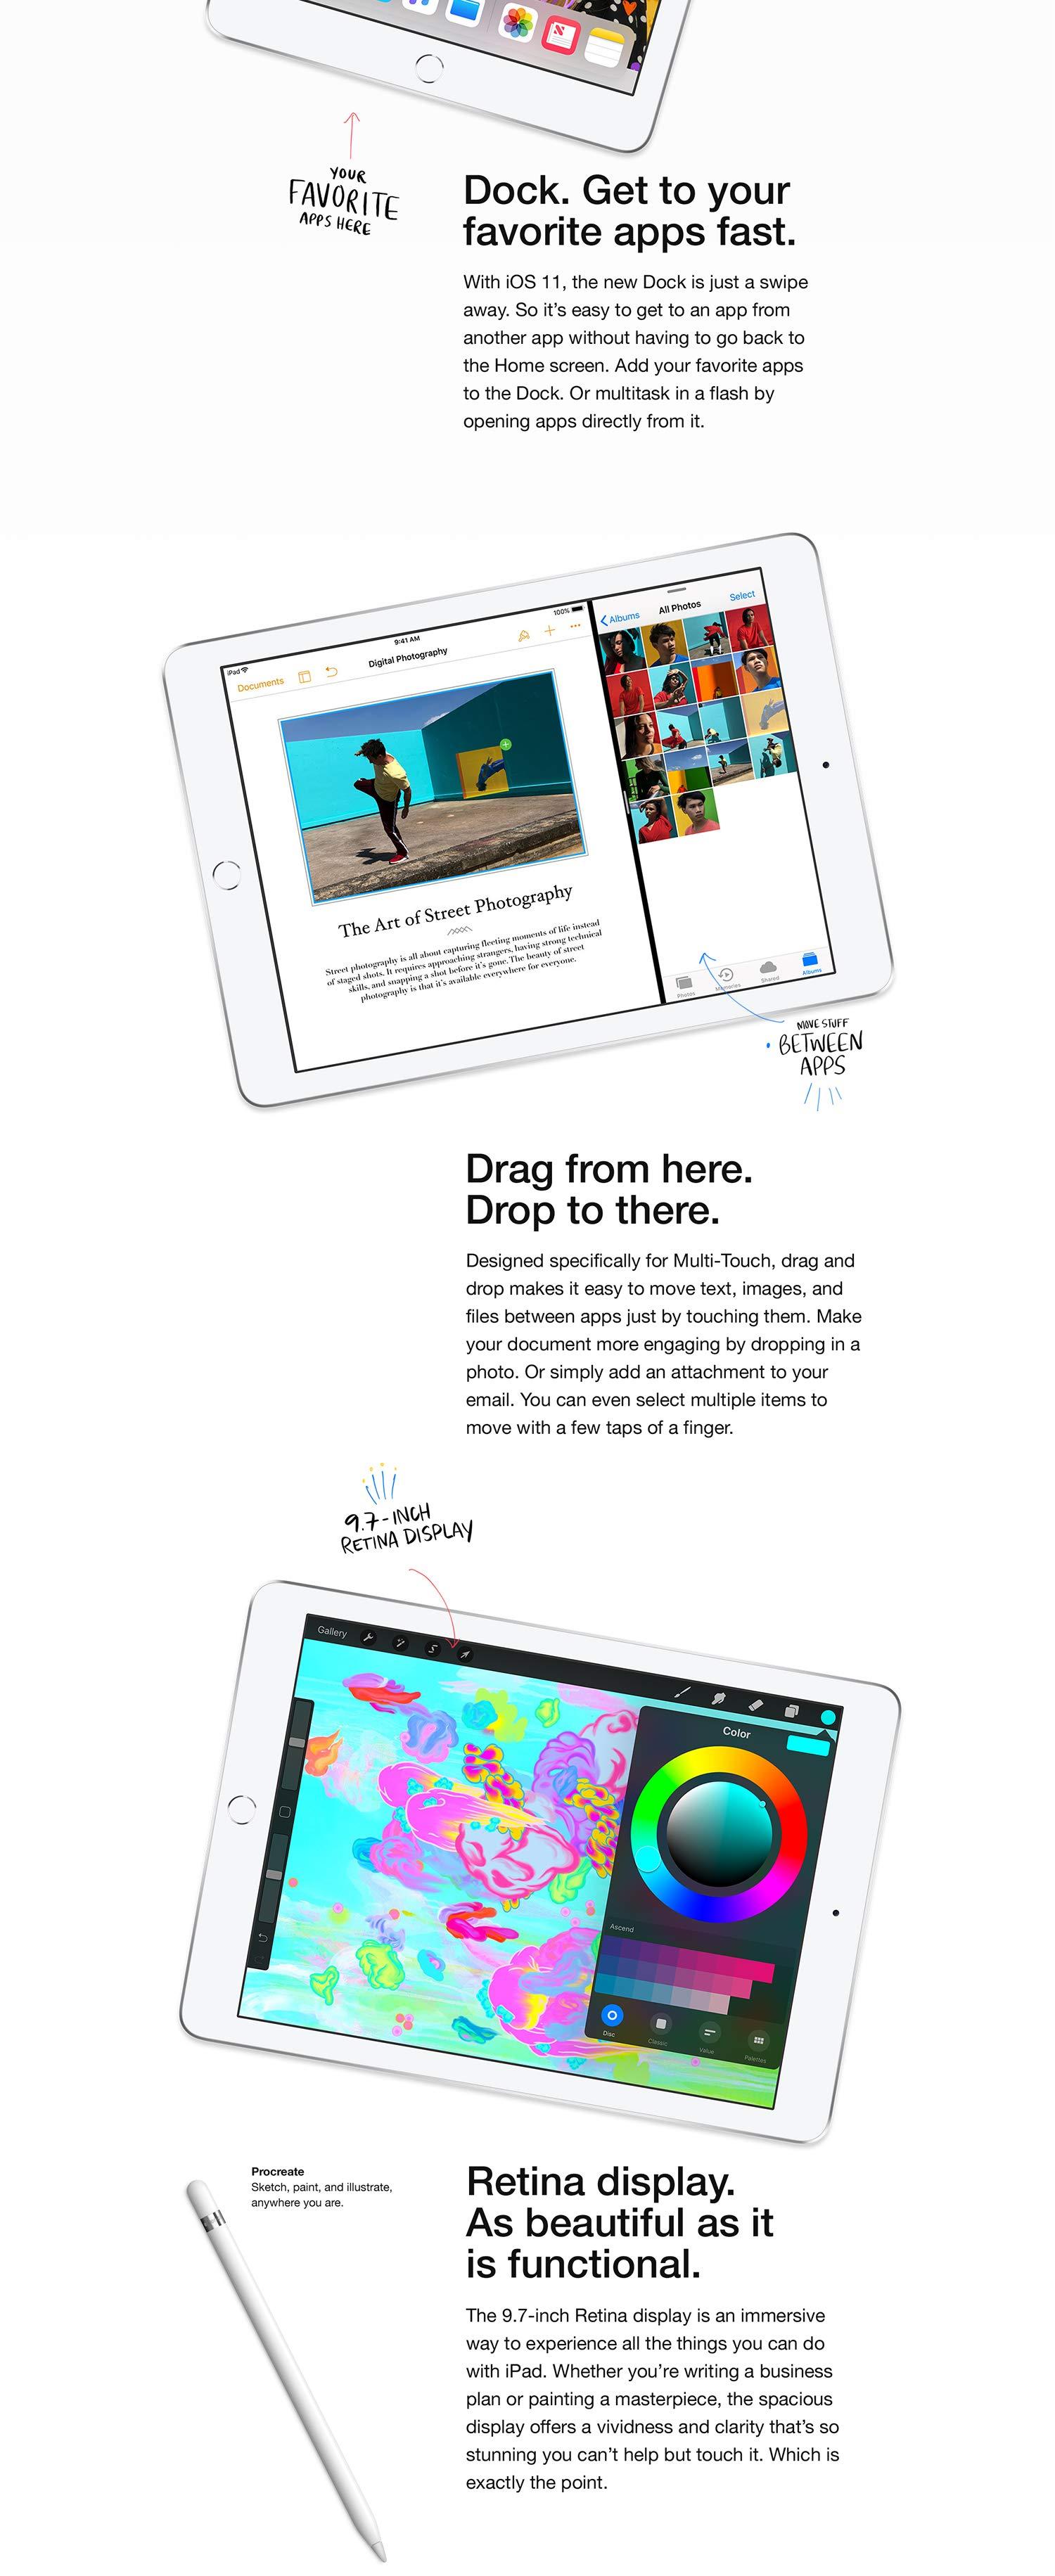 Amazon com : Apple iPad (Wi-Fi, 32GB) - Space Gray (Latest Model) :